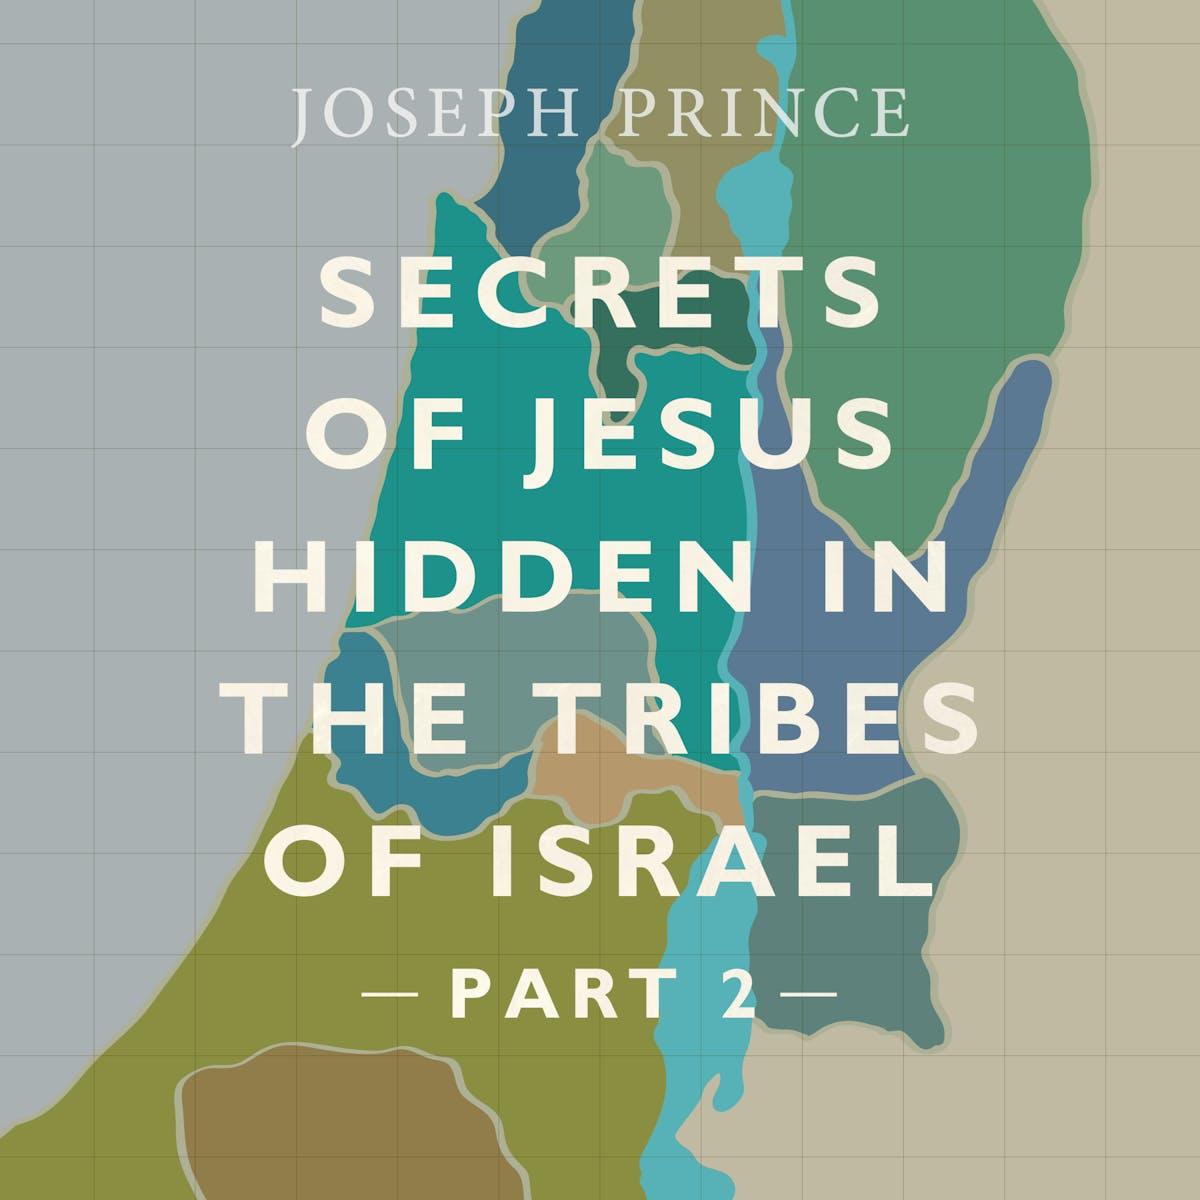 Secrets Of Jesus Hidden In The Tribes Of Israel—Part 2